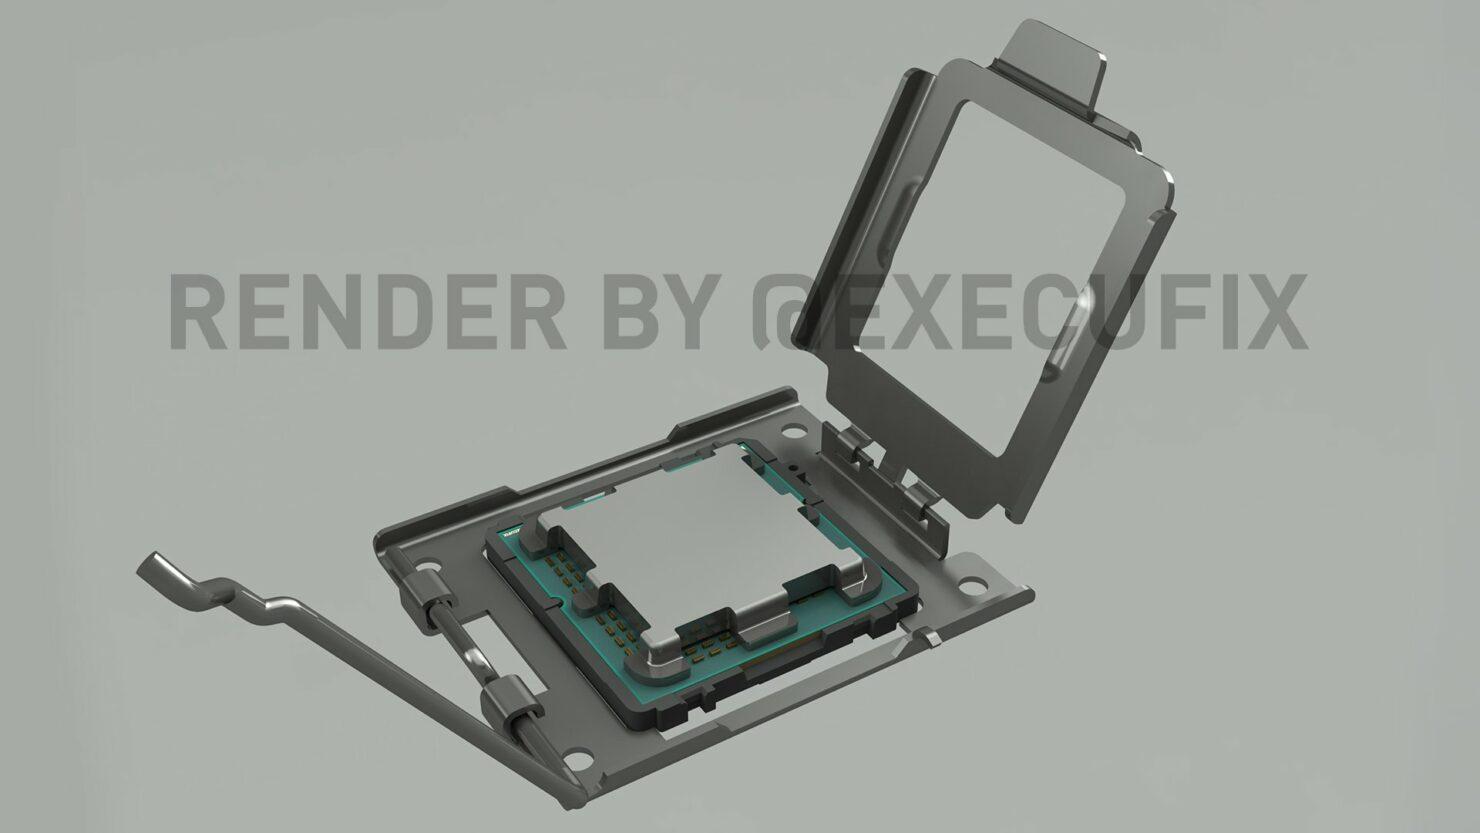 amd-am5-lga-1718-socket-for-next-gen-amd-ryzen-desktop-cpus-render-_3